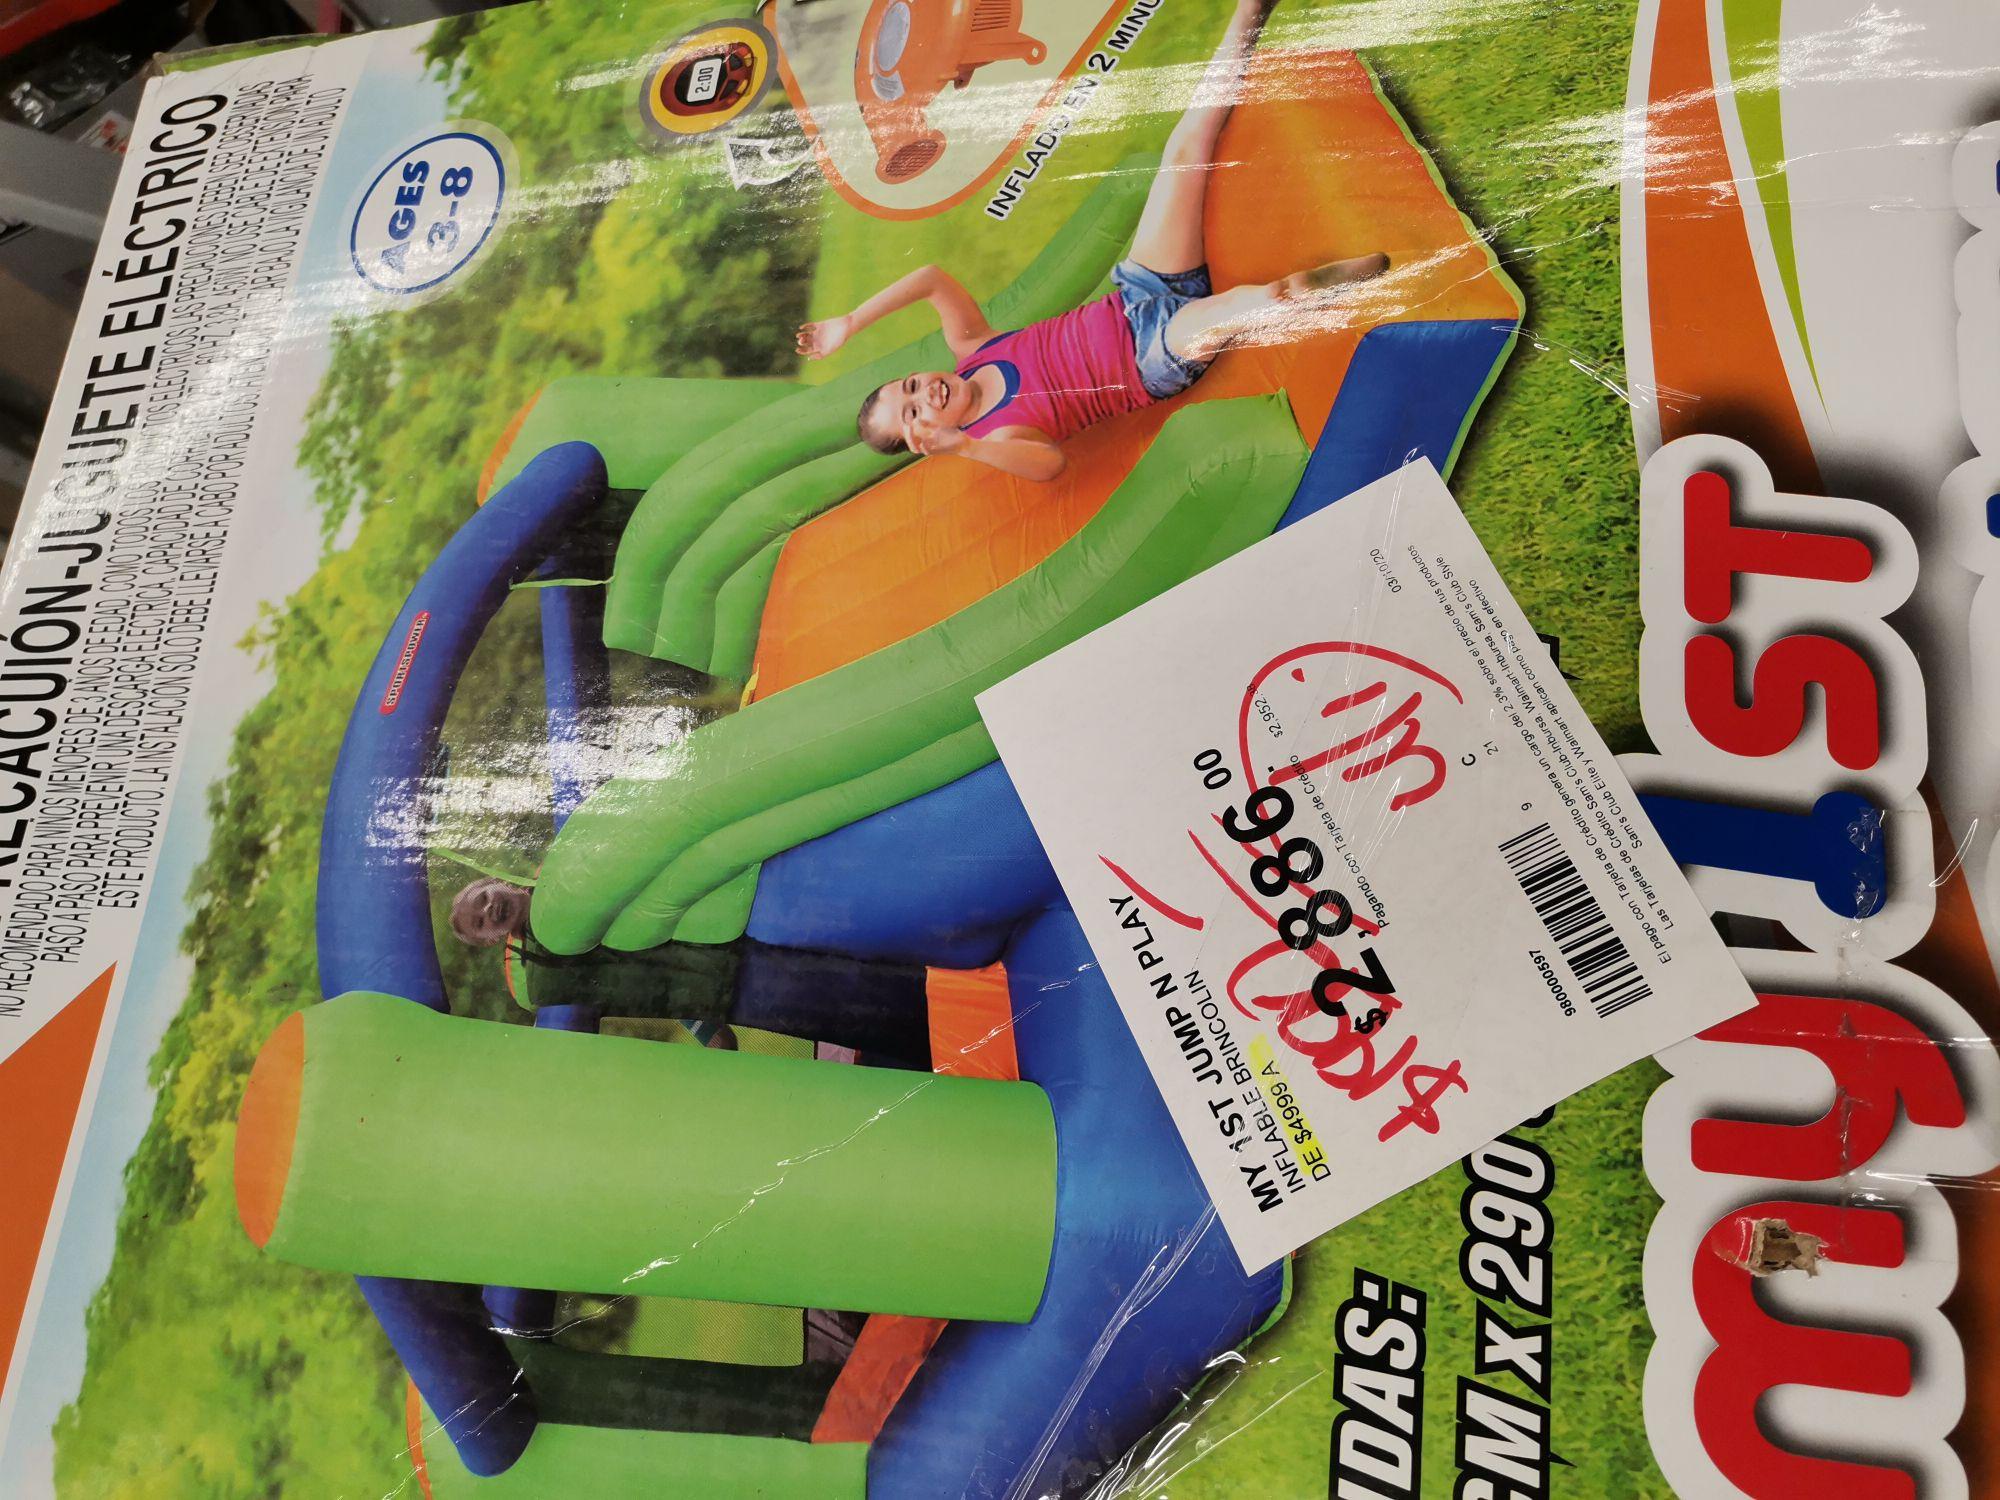 Sam's Club Puerto Vallarta : inflable brincolin